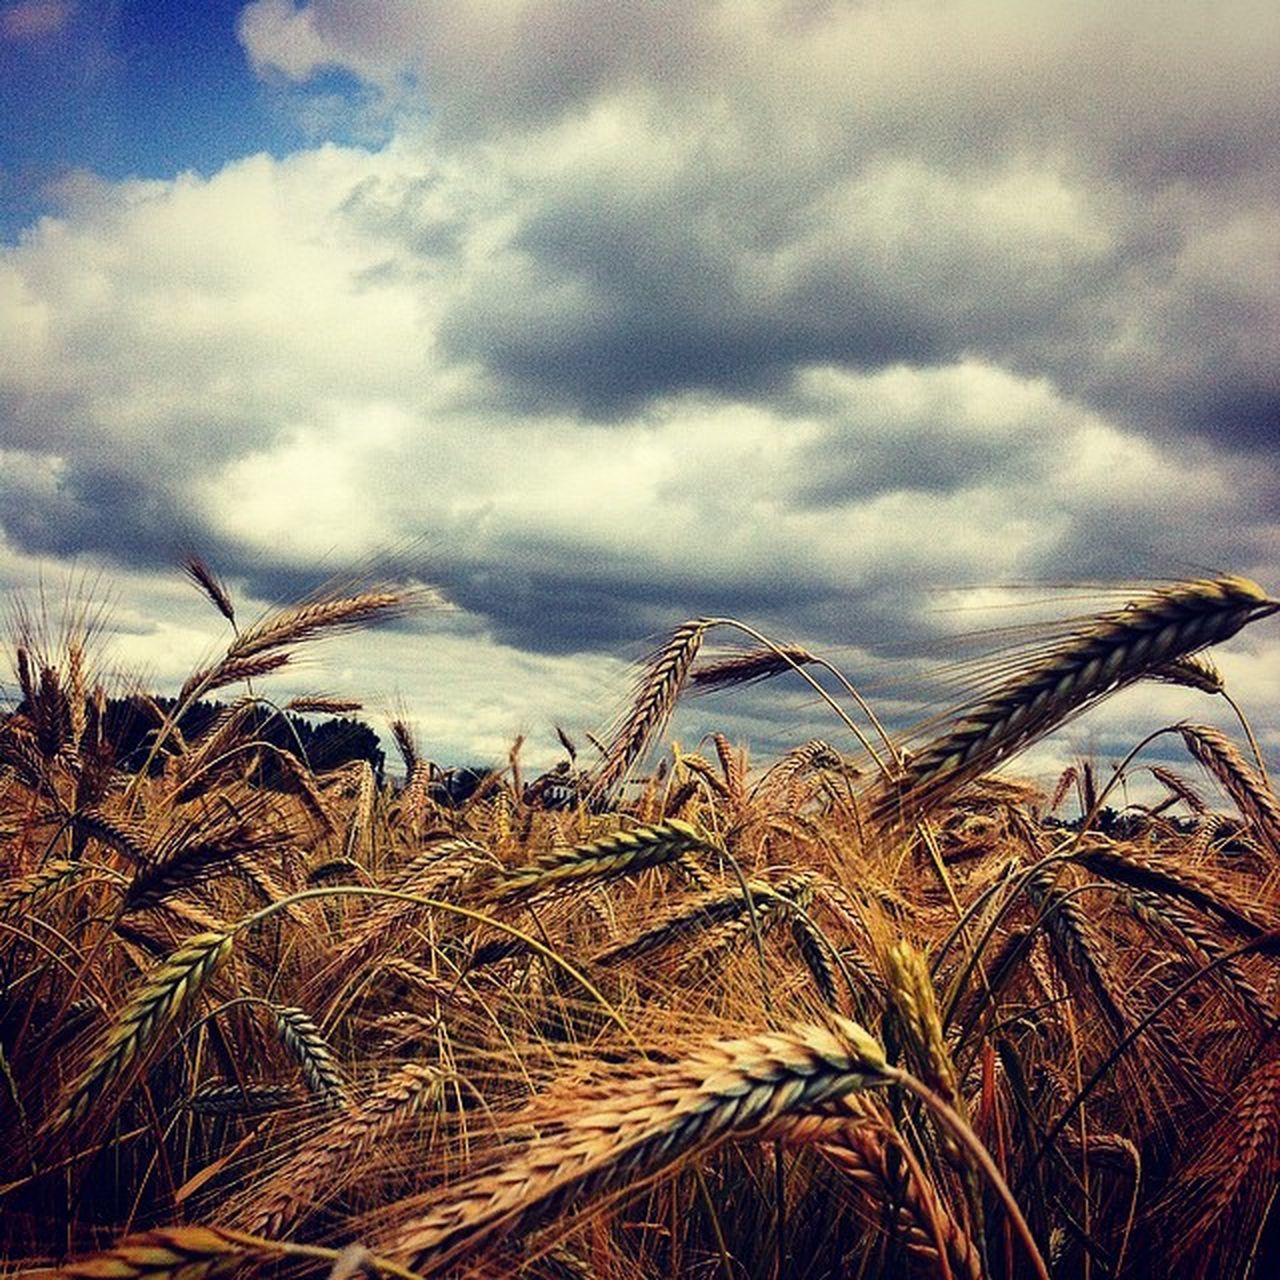 Beautiful Landscape Hungary Homesweethome Kunágota ilovesummer ihu insta_kunágota instahun ig_europe ikozosseg instadaily instaphoto wheat mik magyarig mademyday mik_summer missthisview colors sky skyporn cloud cloudporn loves_hungary 🎑 ig_magyarország